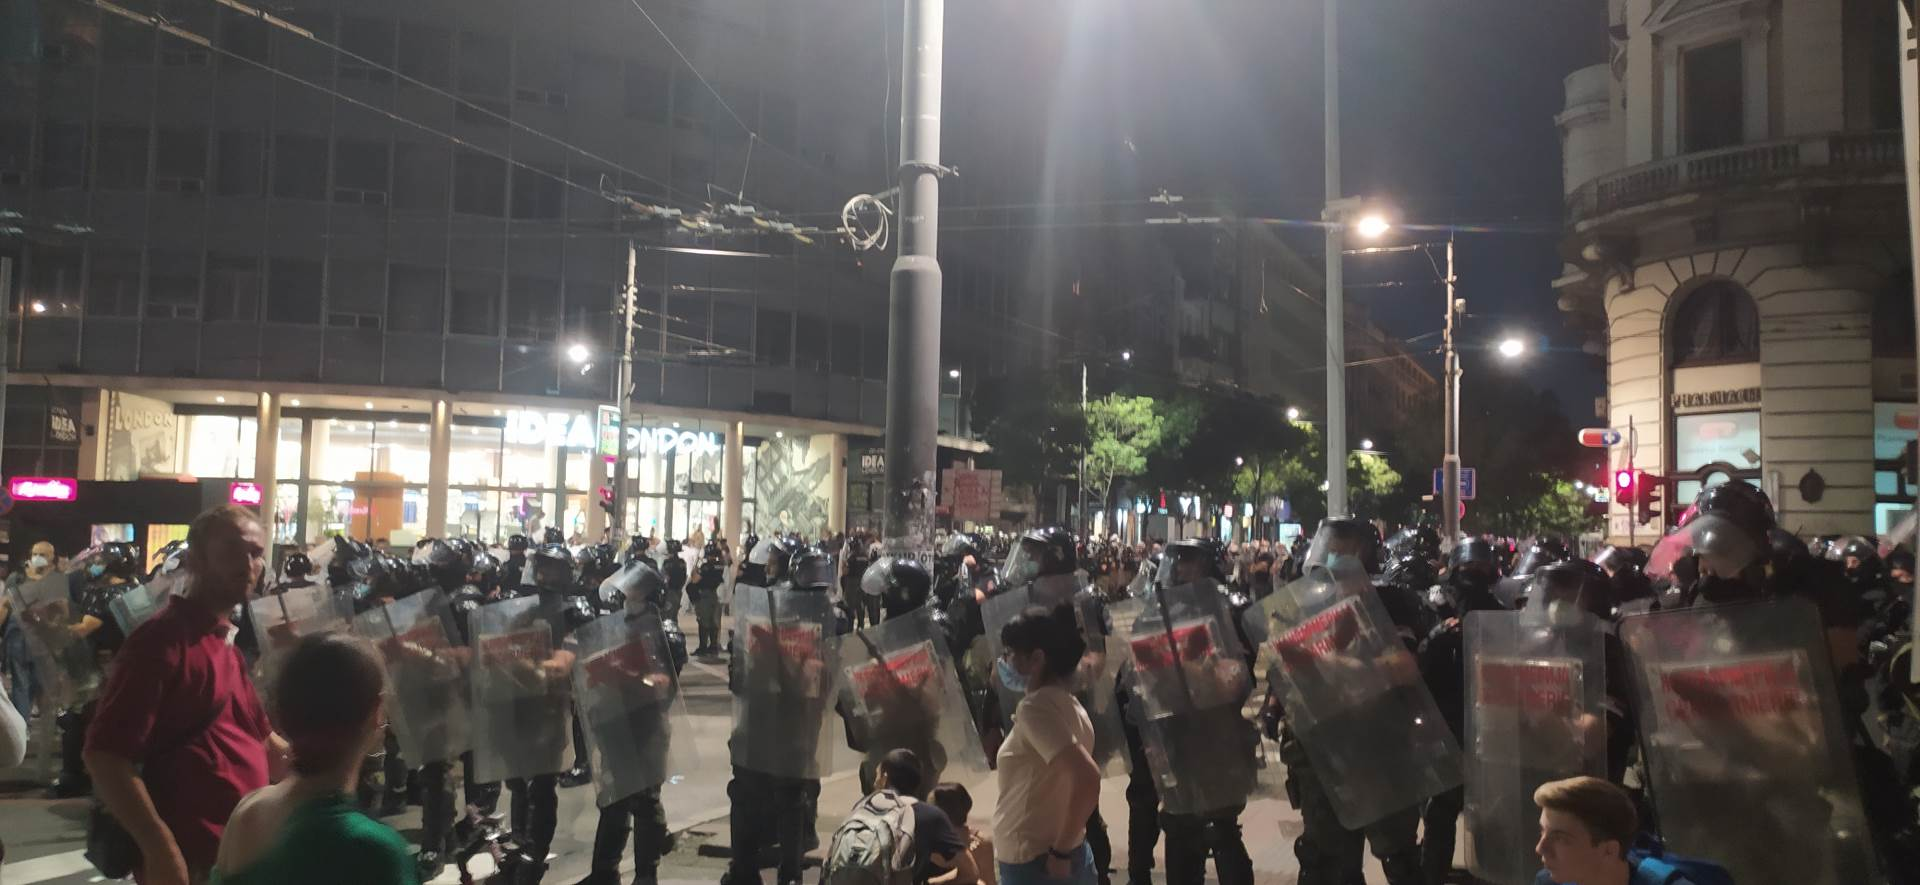 kordon lonon policija protest